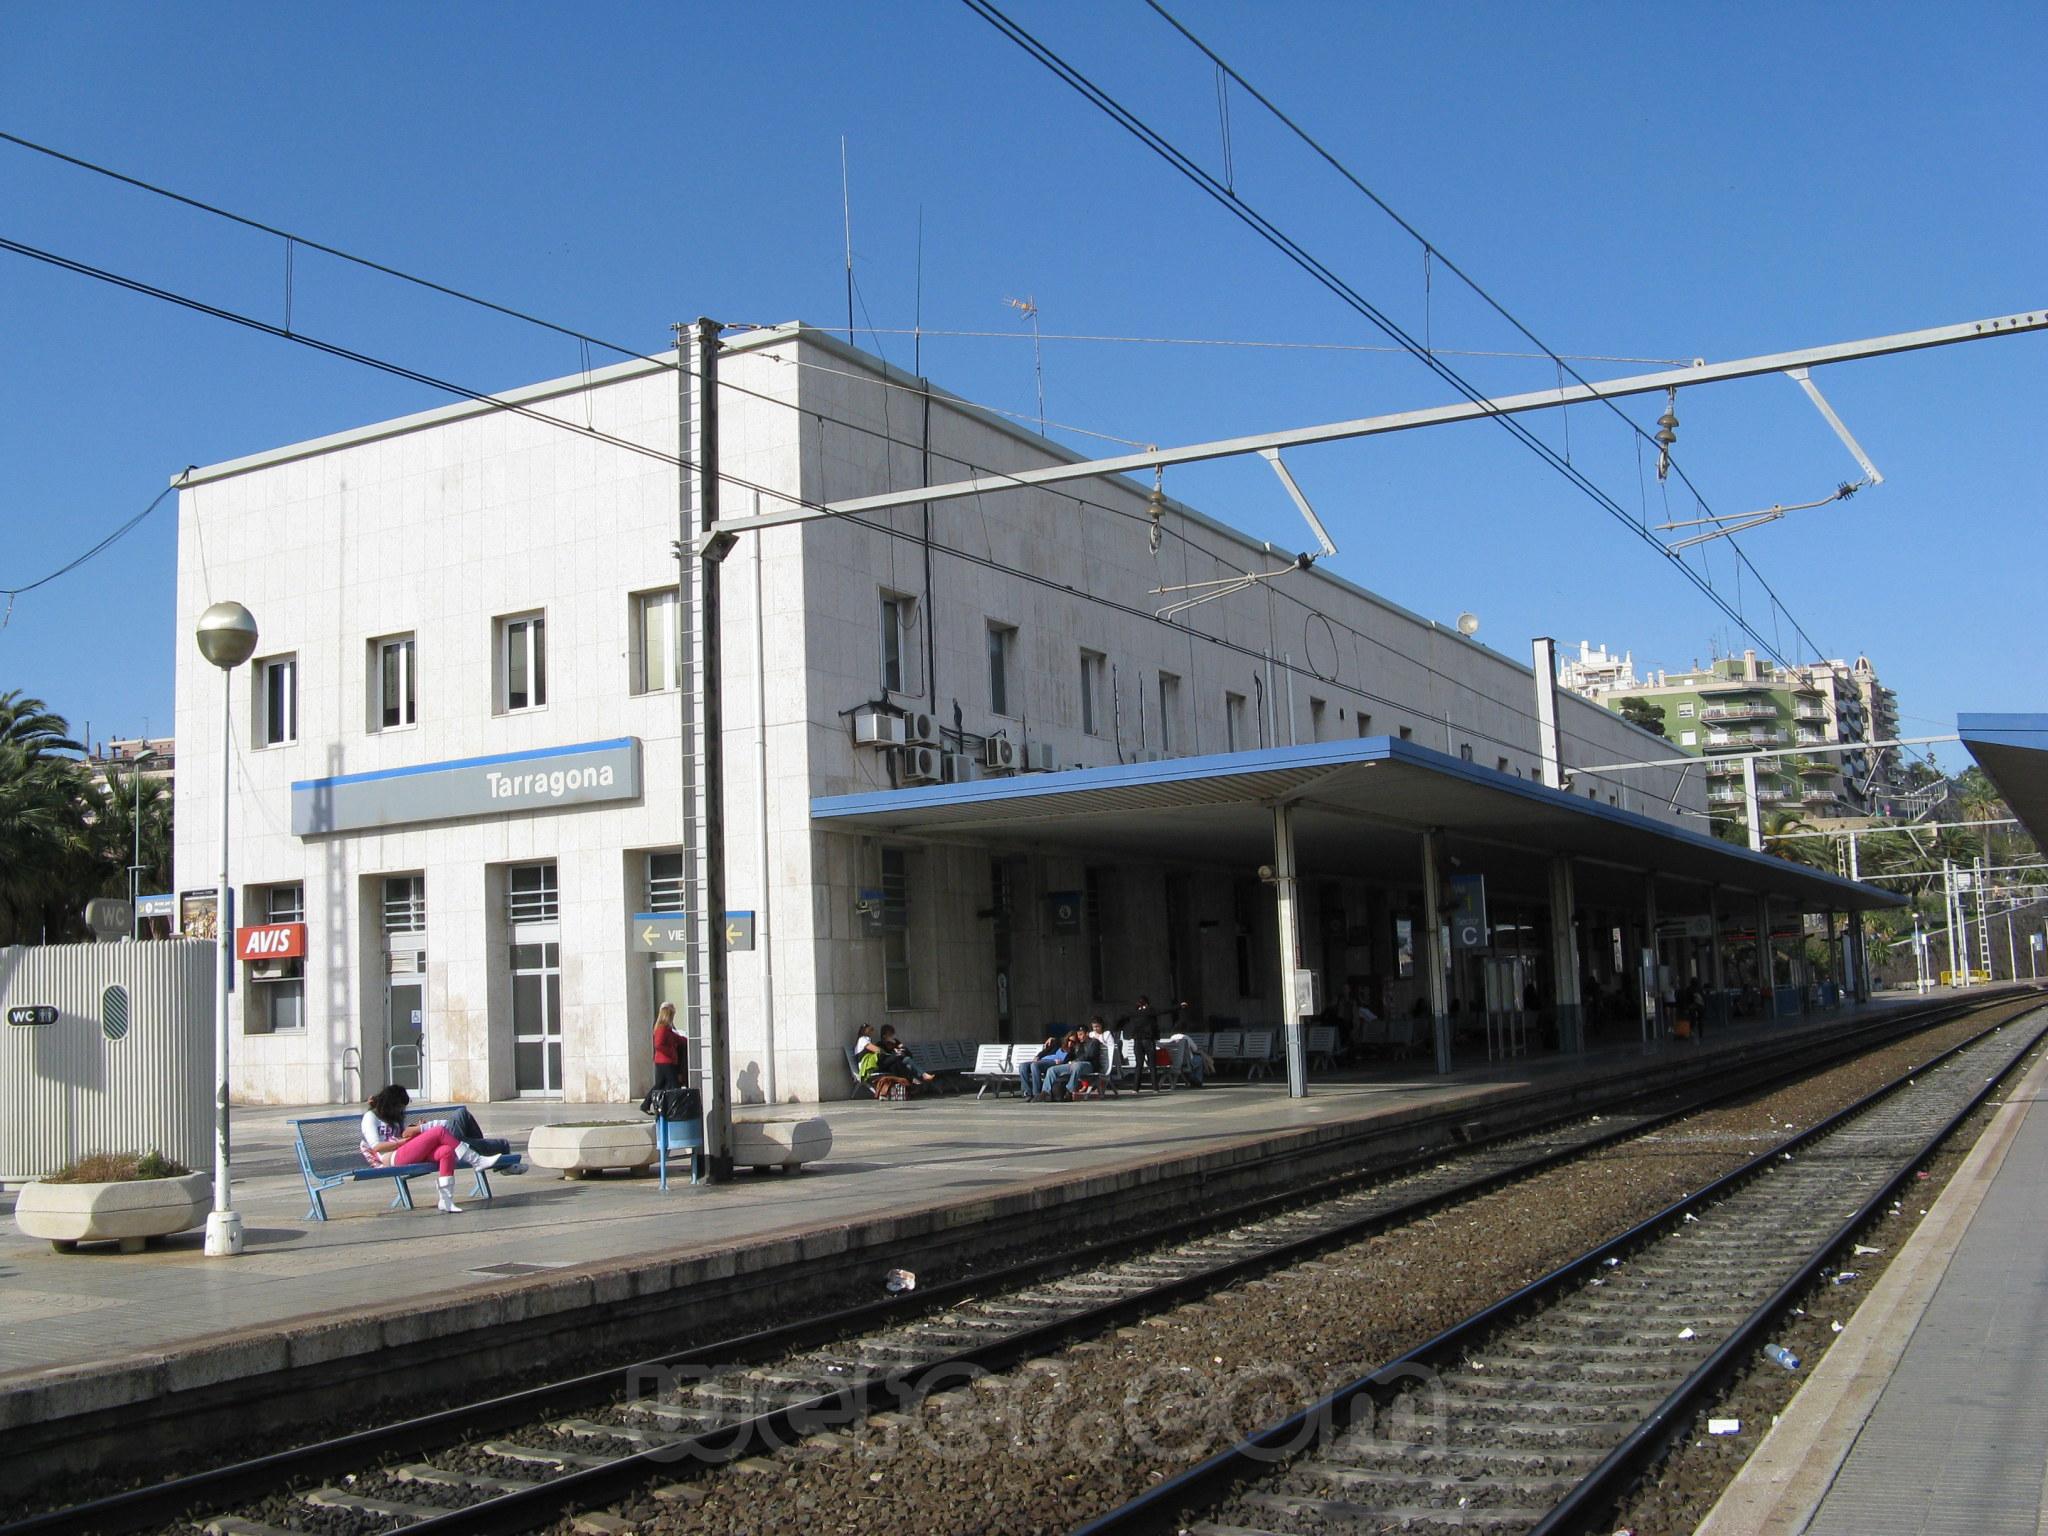 Renfe / ADIF: Tarragona